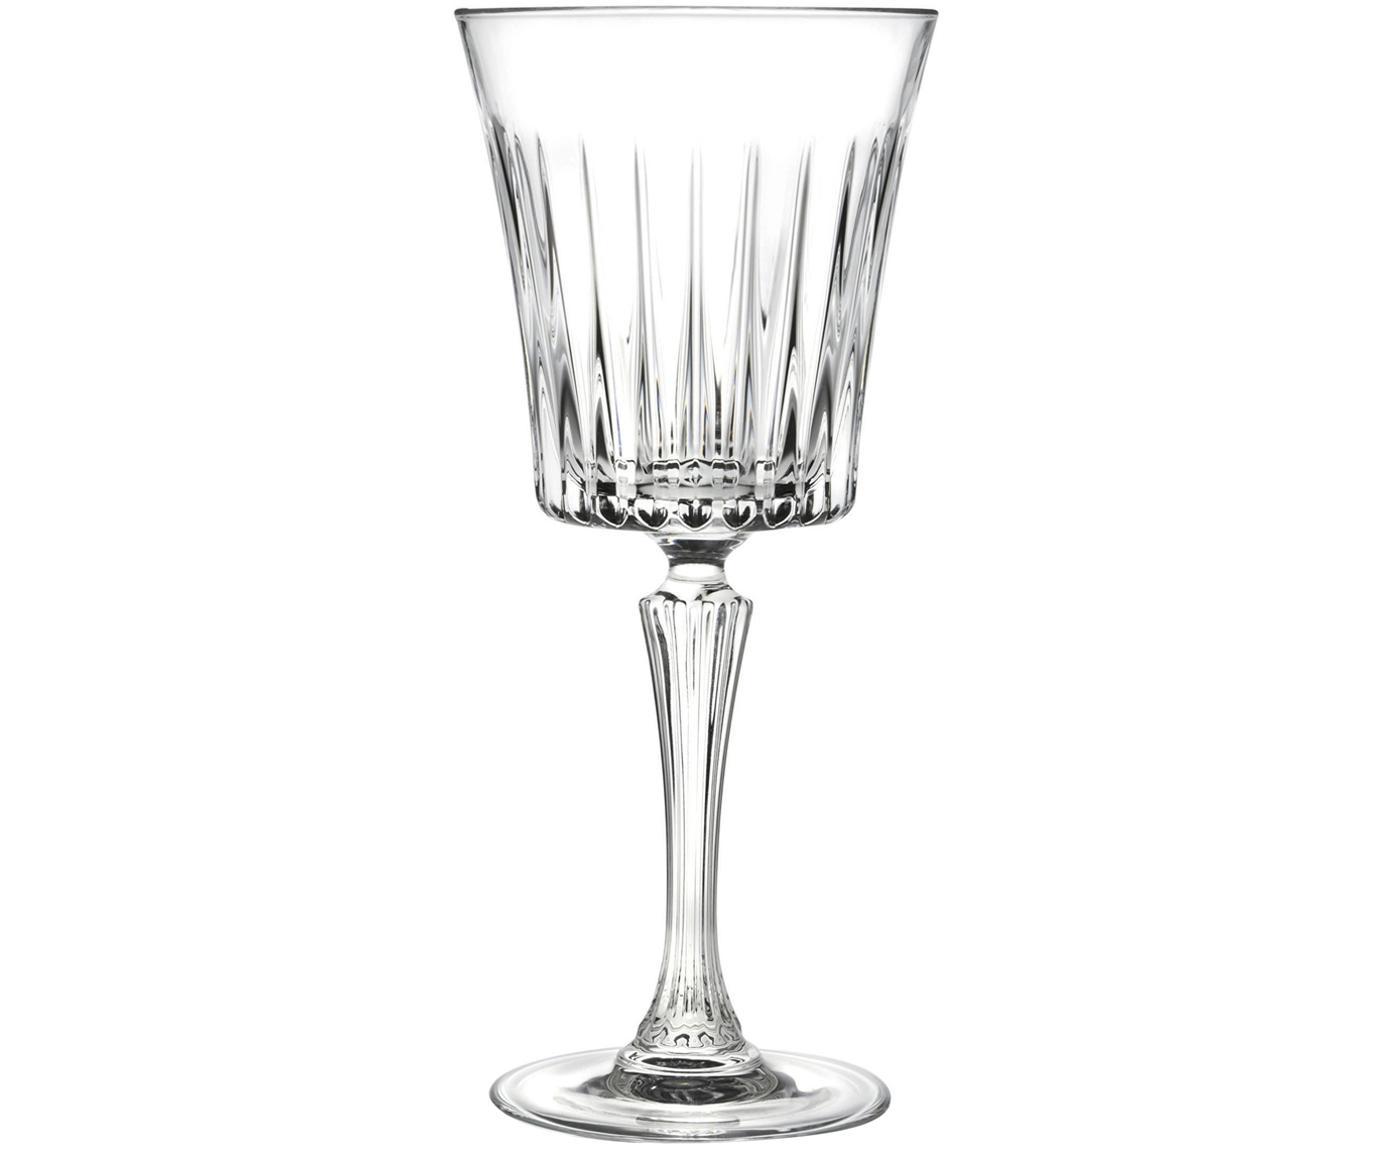 Copas de vino tinto de cristal Timeless, 6uds., Cristal, Transparente, Ø 9 x Al 21 cm